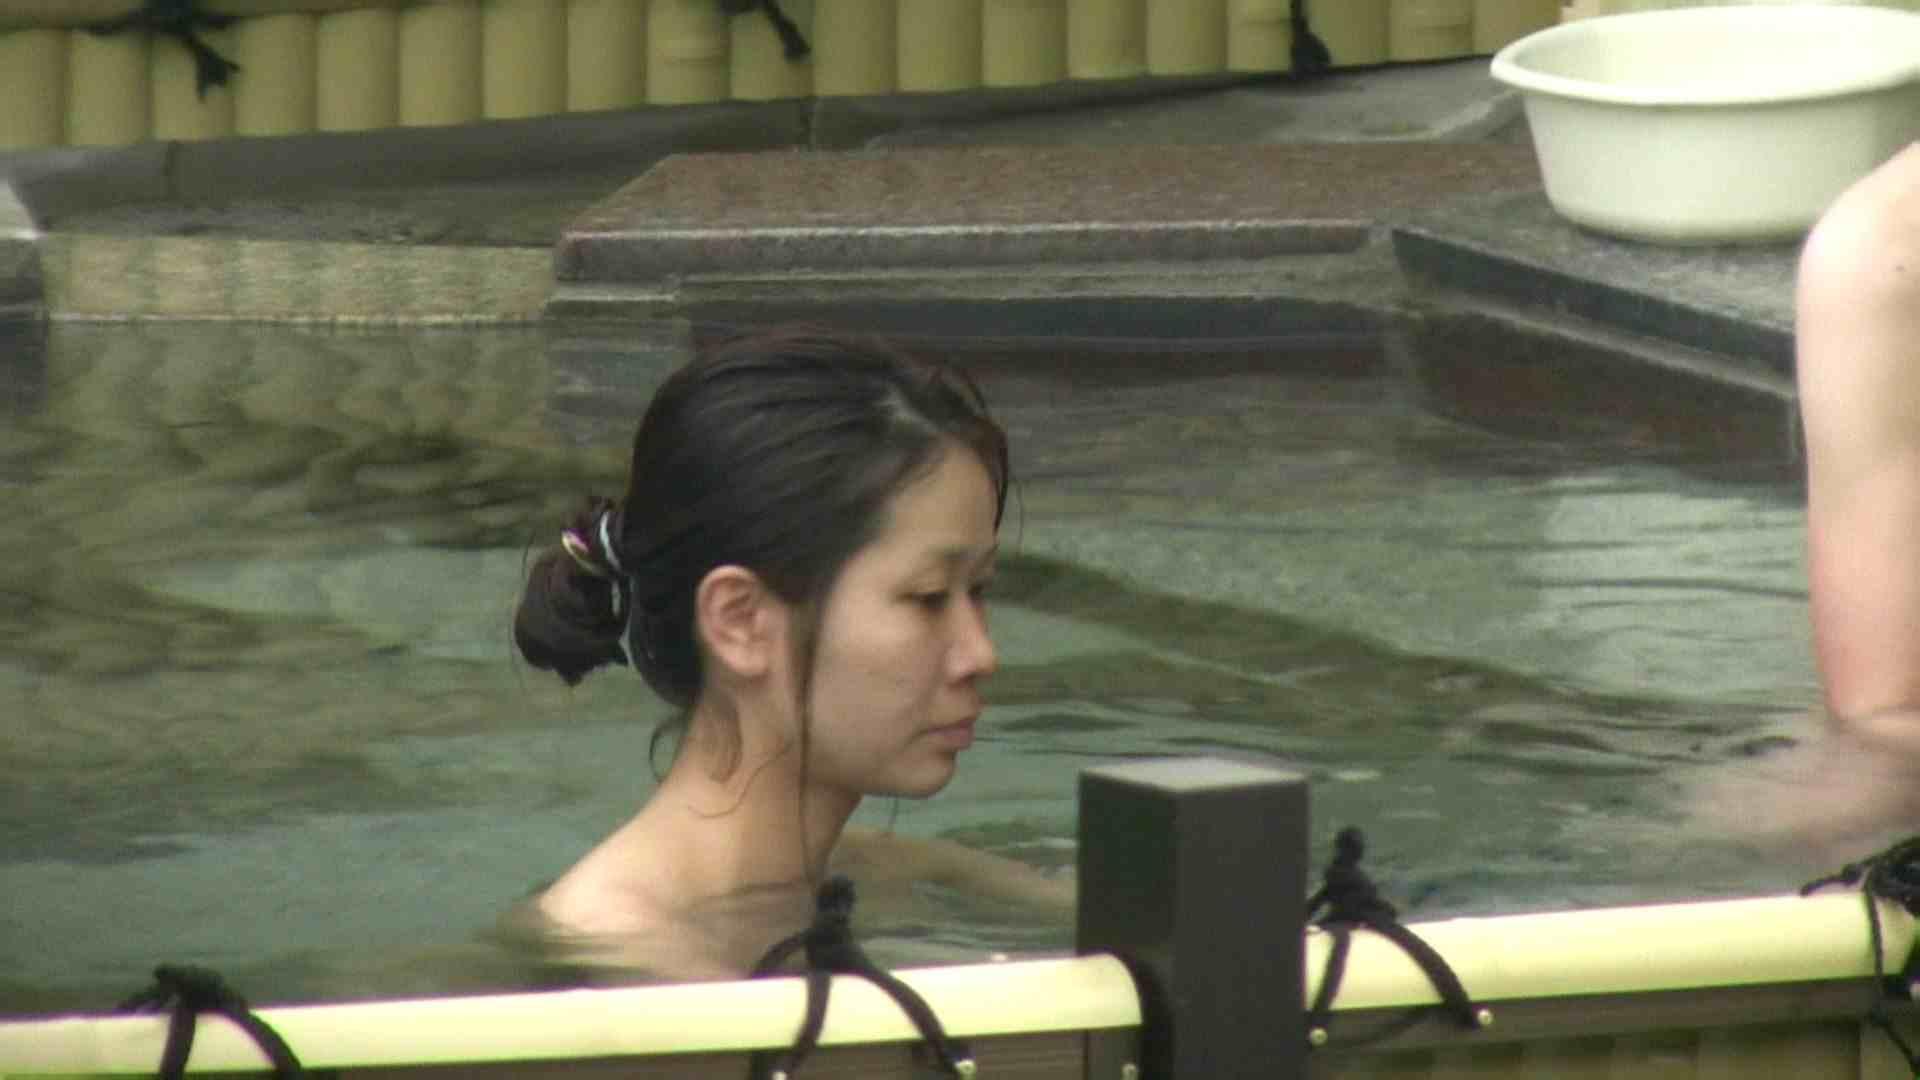 Aquaな露天風呂Vol.07 盗撮シリーズ   露天風呂編  94PIX 23